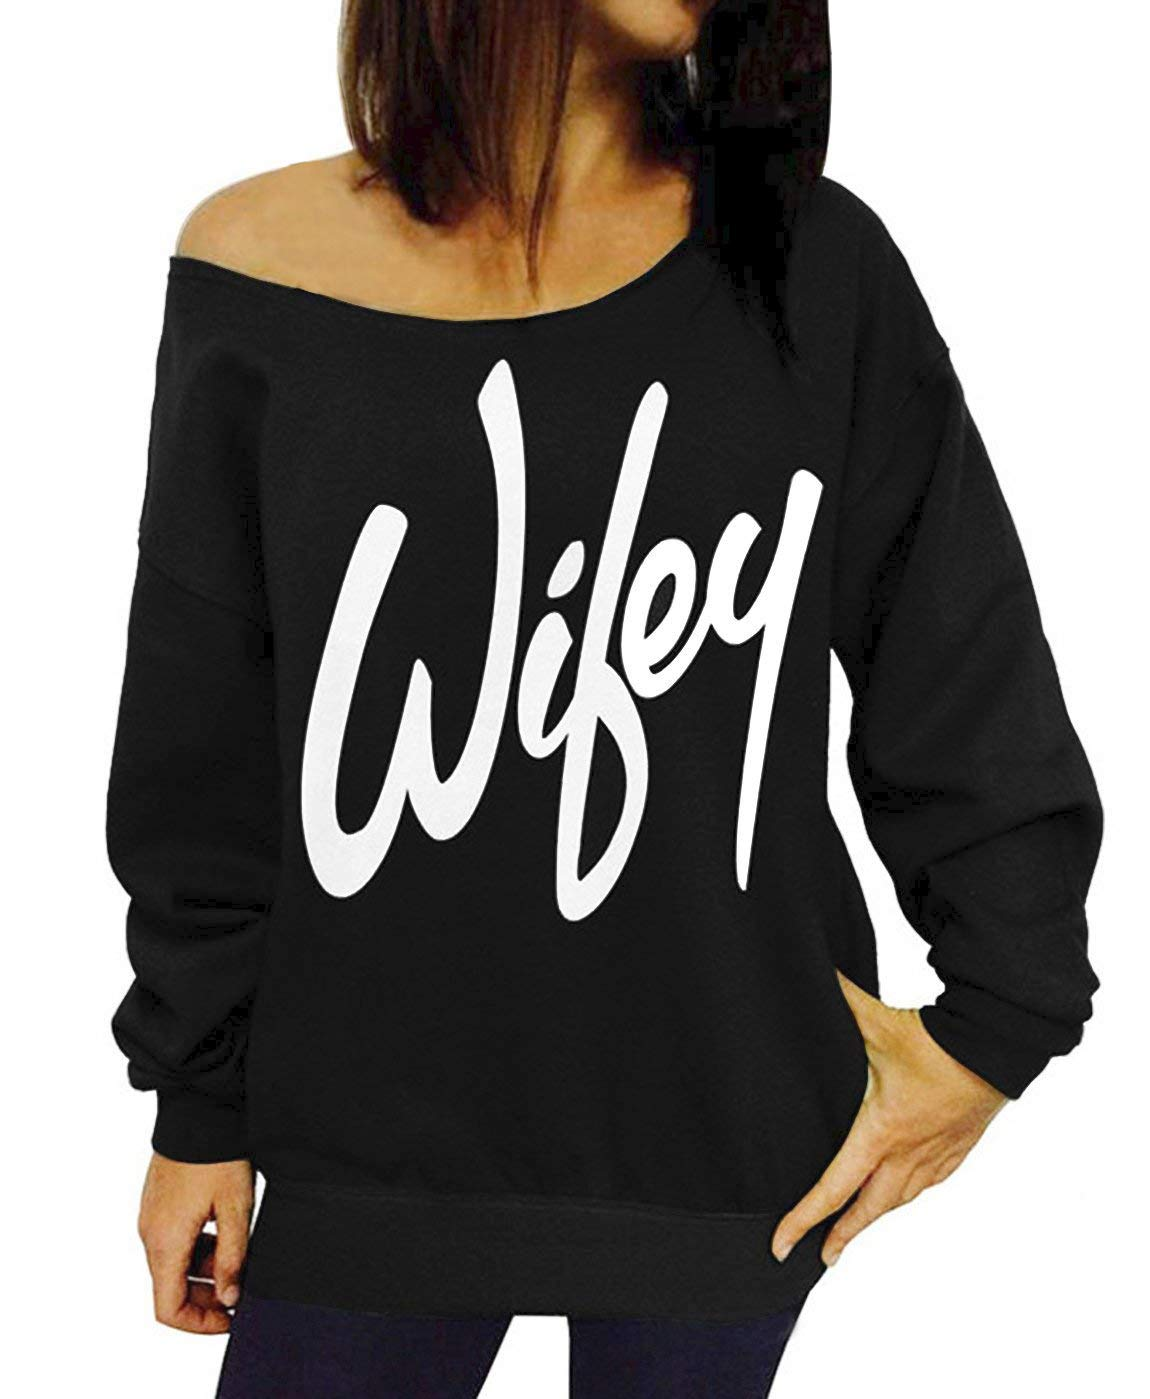 RJXDLT Women's Off Shoulder Sweatshirt Slouchy Pullover Tops Long Sleeve Casual Shirt Love M